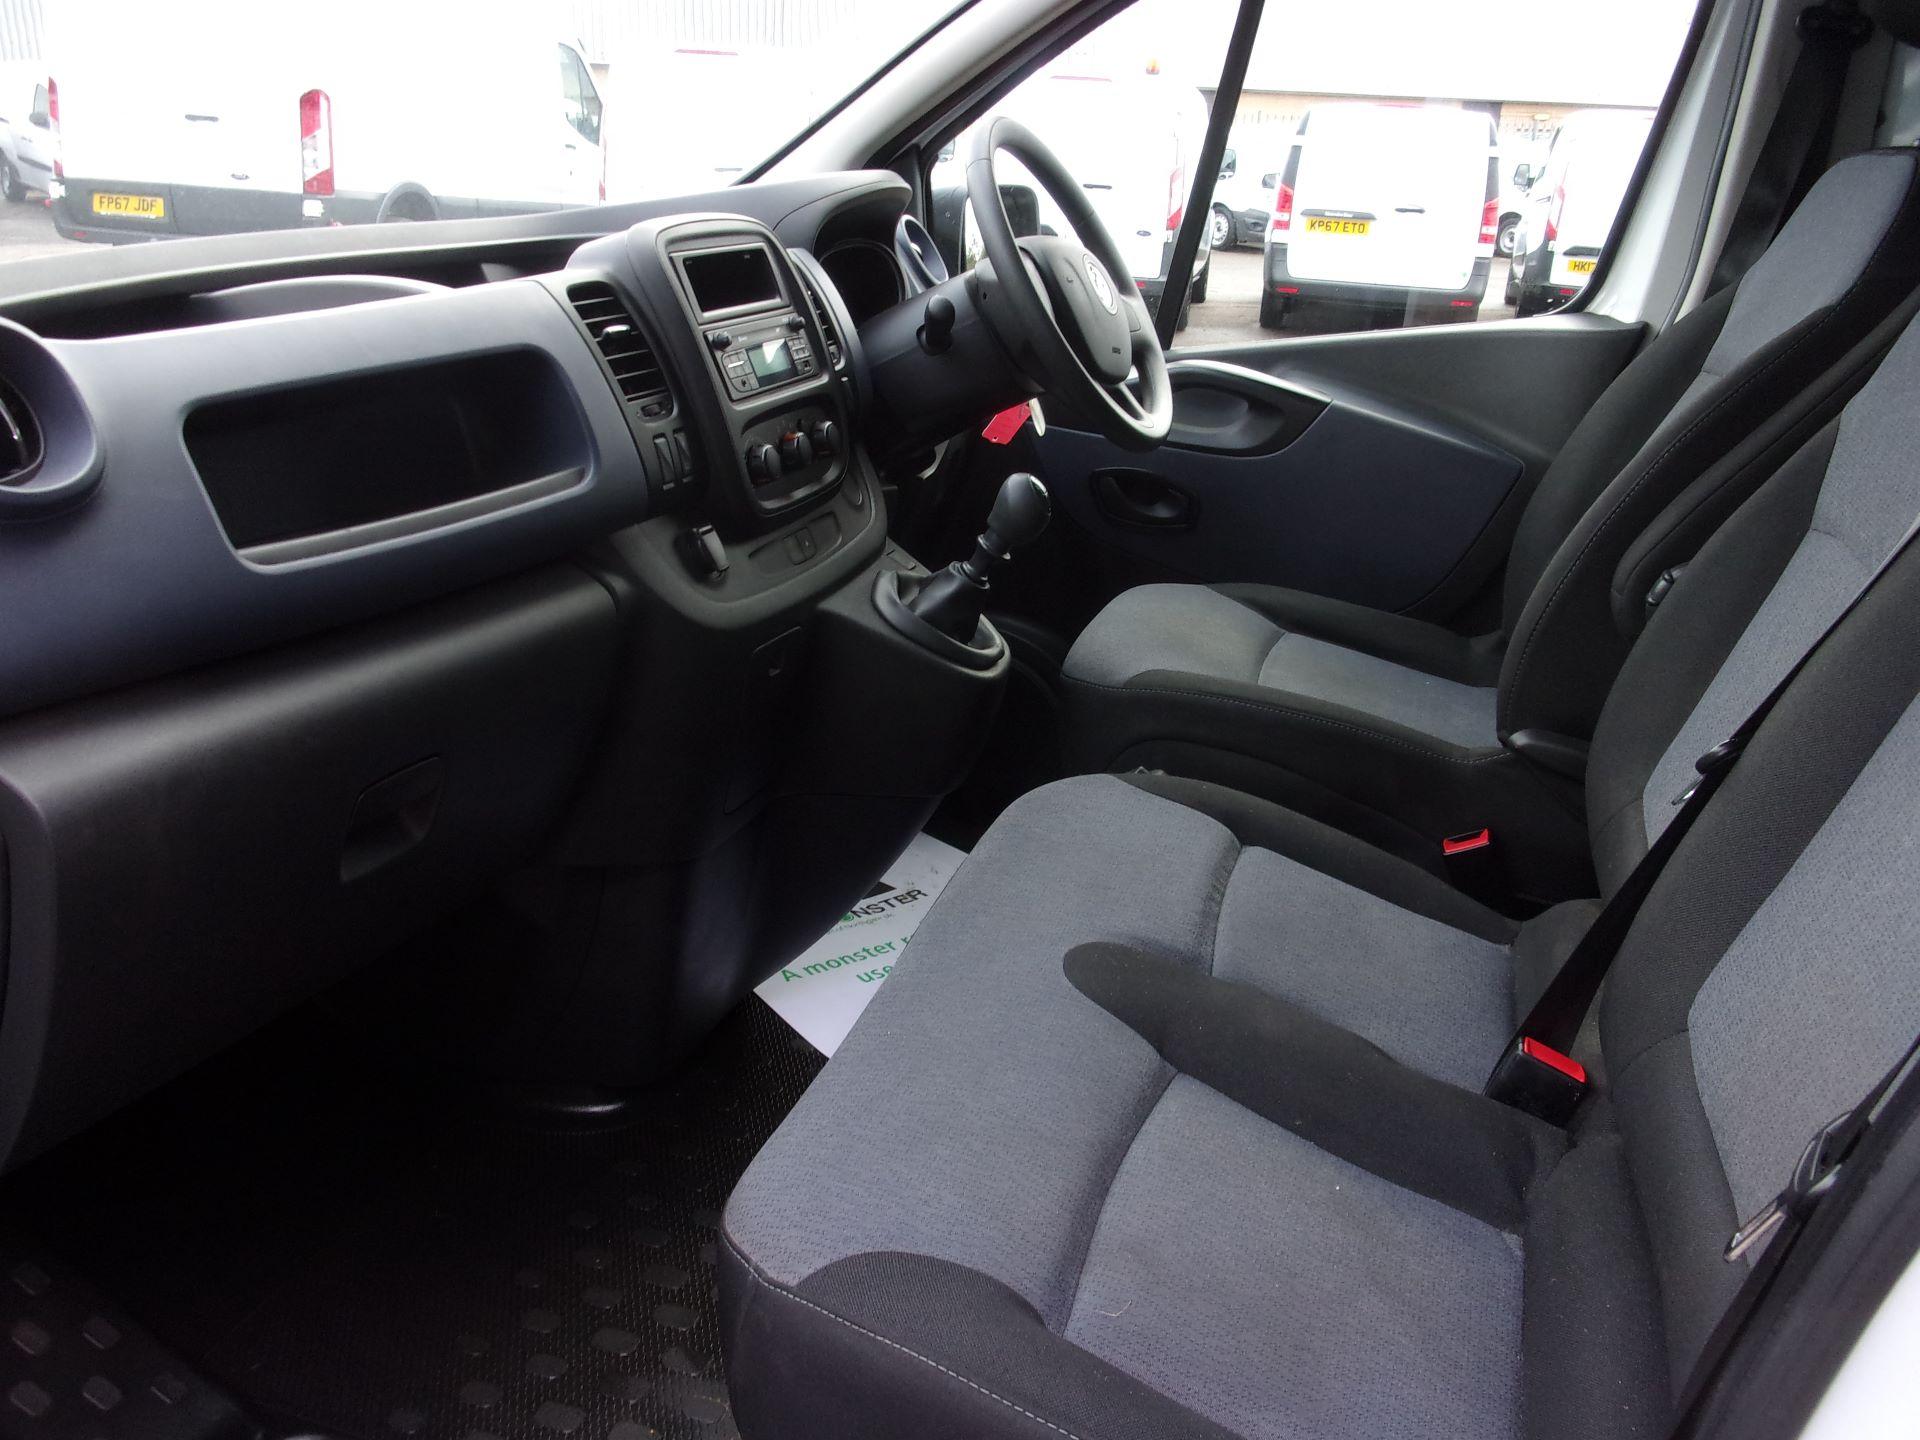 2017 Vauxhall Vivaro L2 H1 2900 1.6 CDTI 120PS EURO 6 (DY67DWG) Image 13